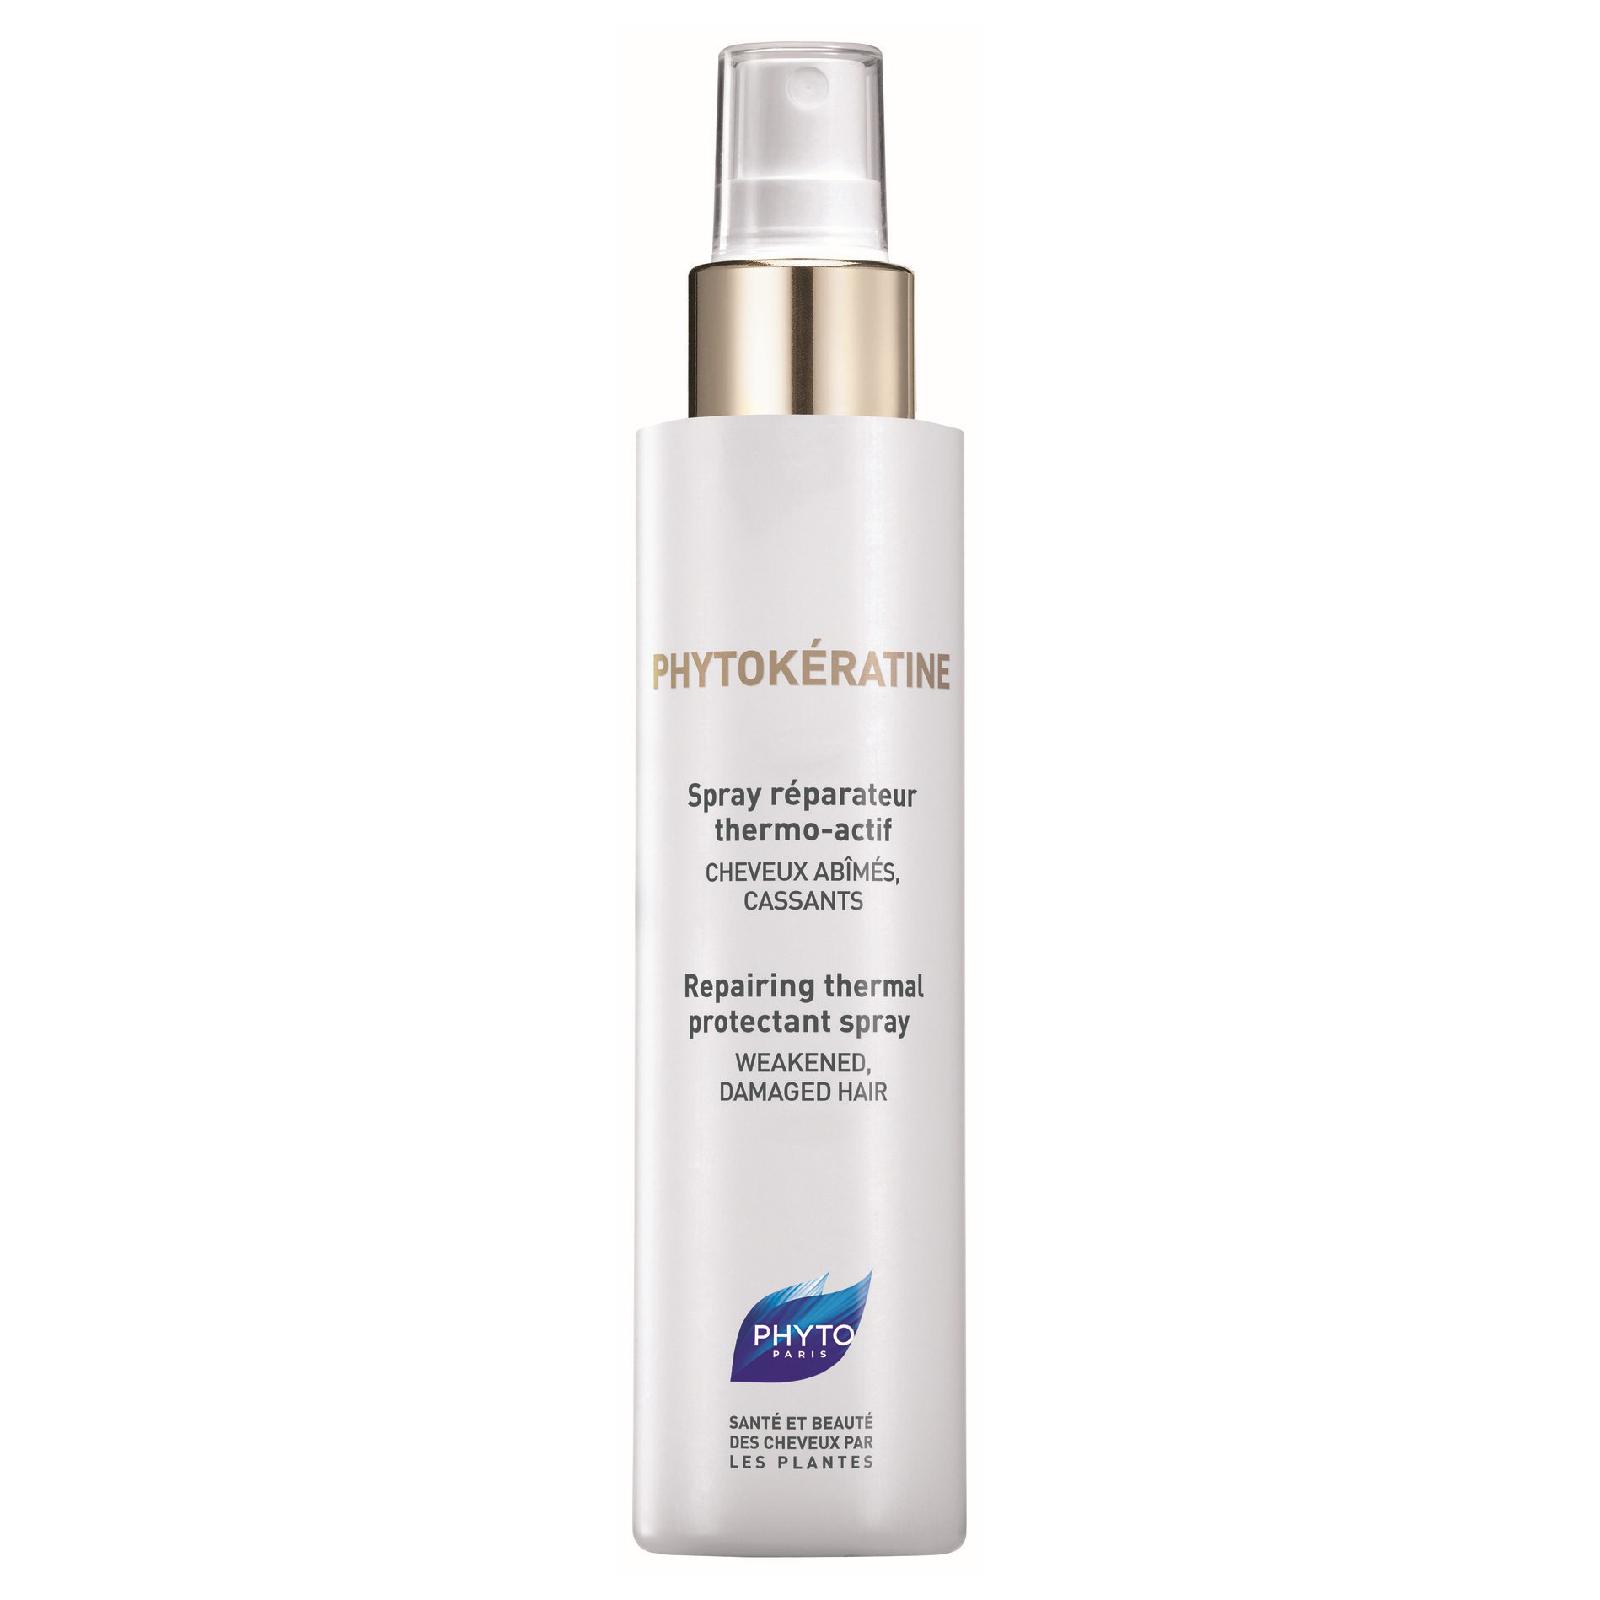 Phyto Phytokeratine Repairing Thermal Protectant Spray